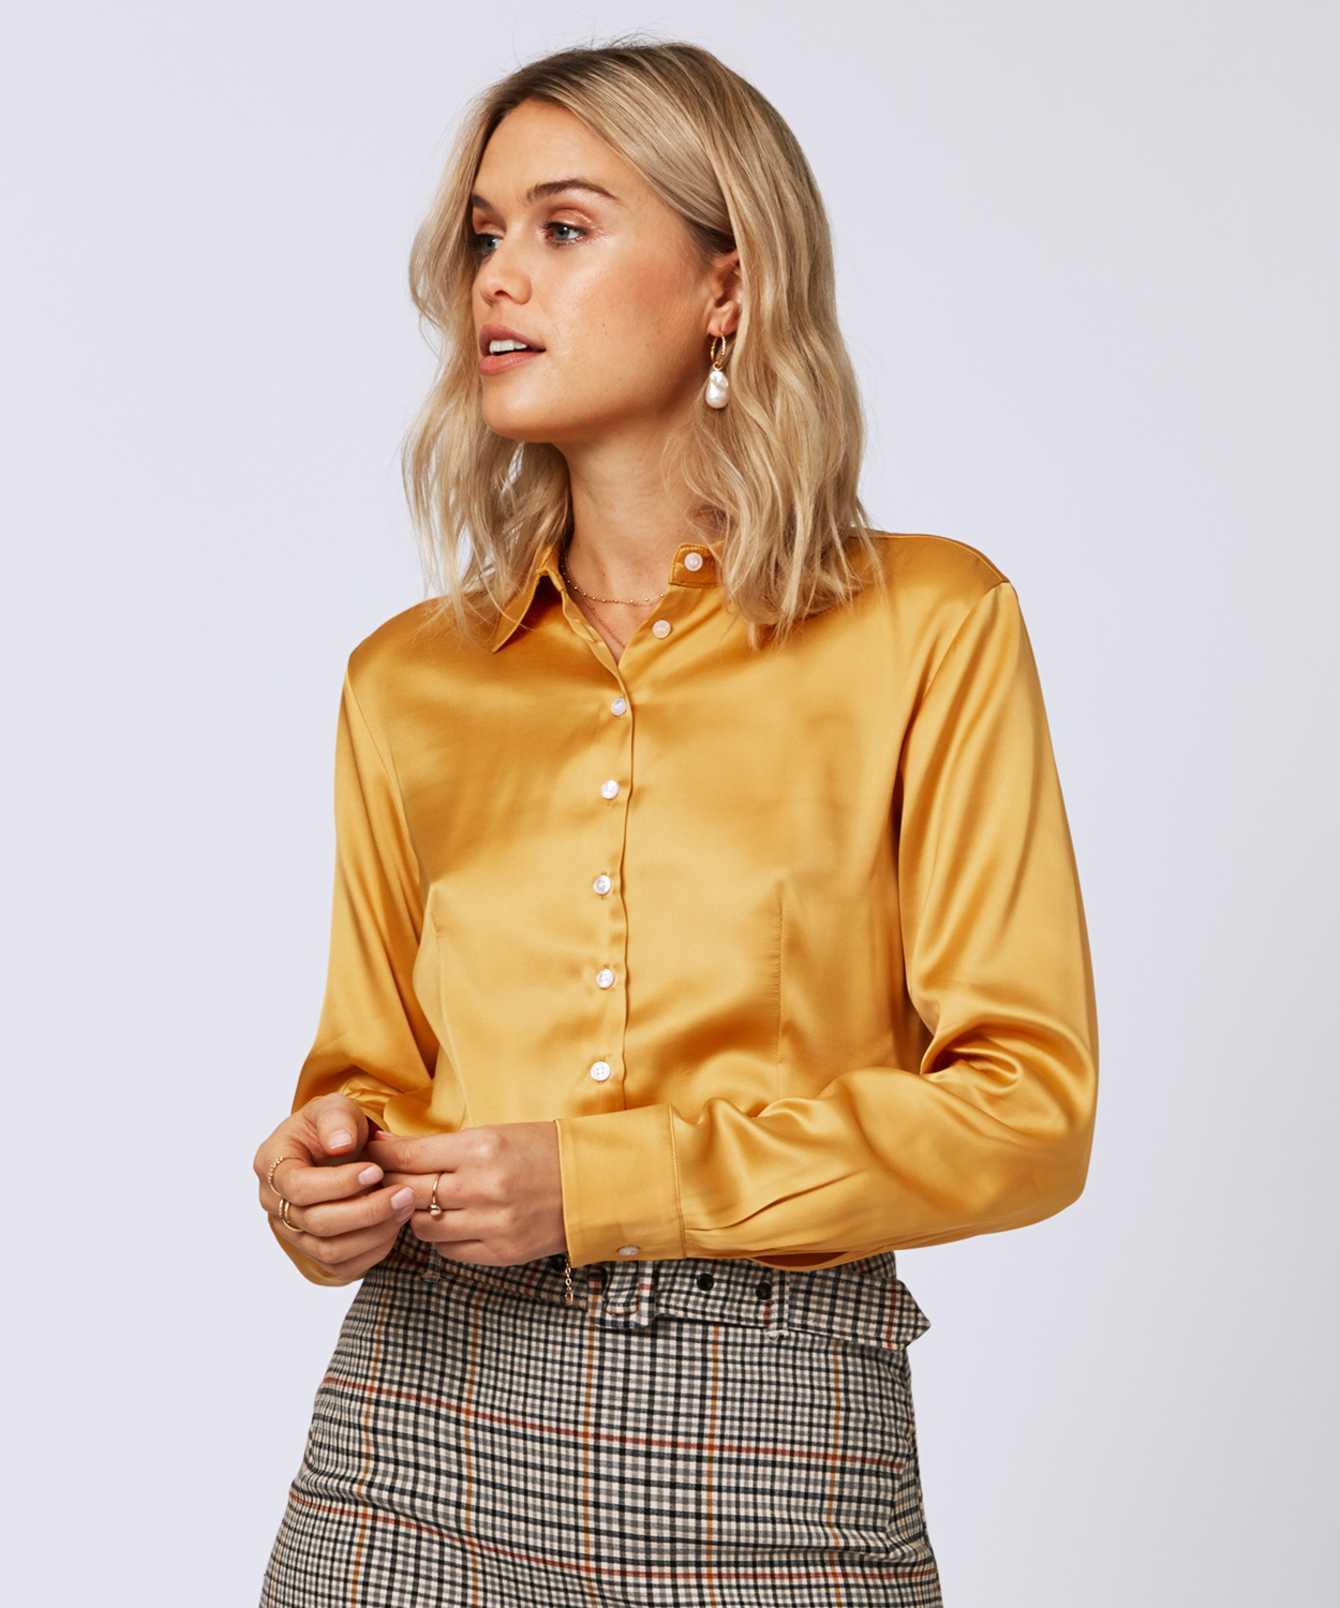 Shirt Tilde Sublime Guld  The Shirt Factory